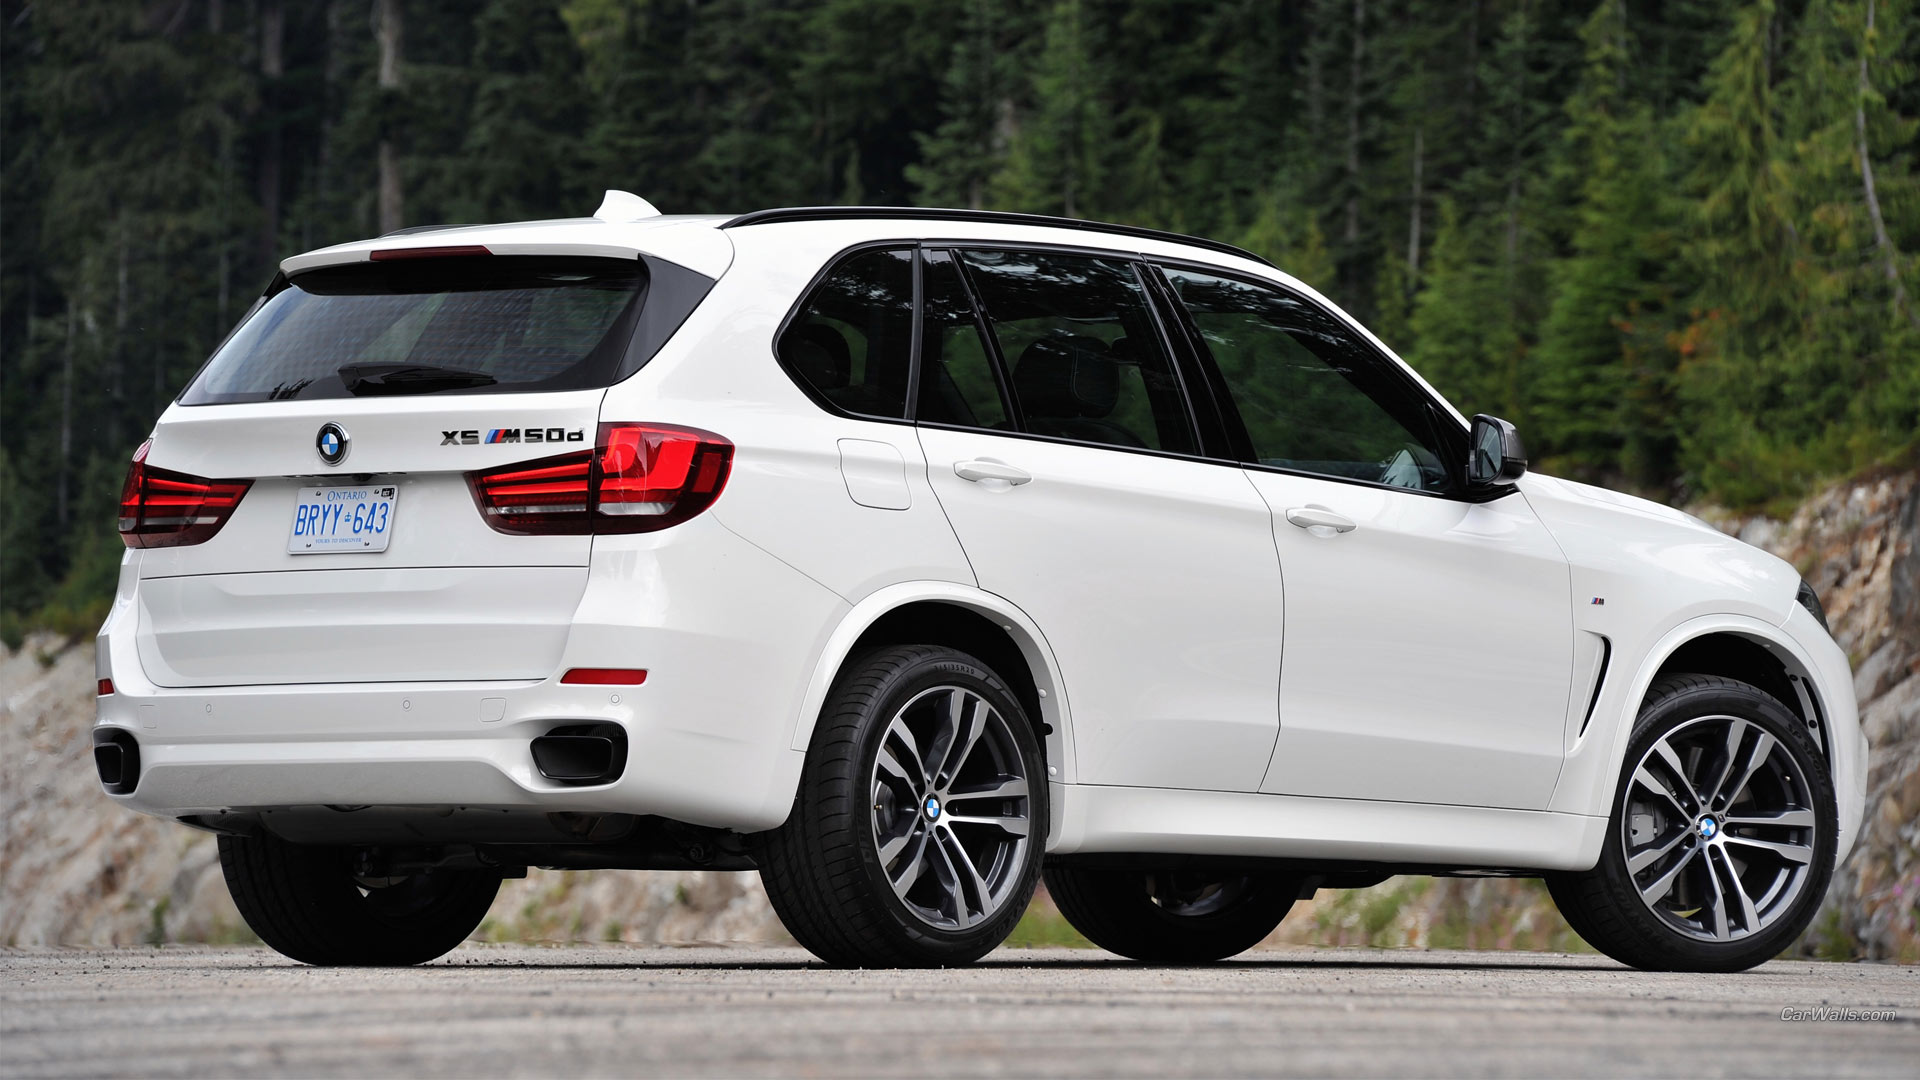 2014 BMW X5 M50d HD Wallpaper | Background Image ...